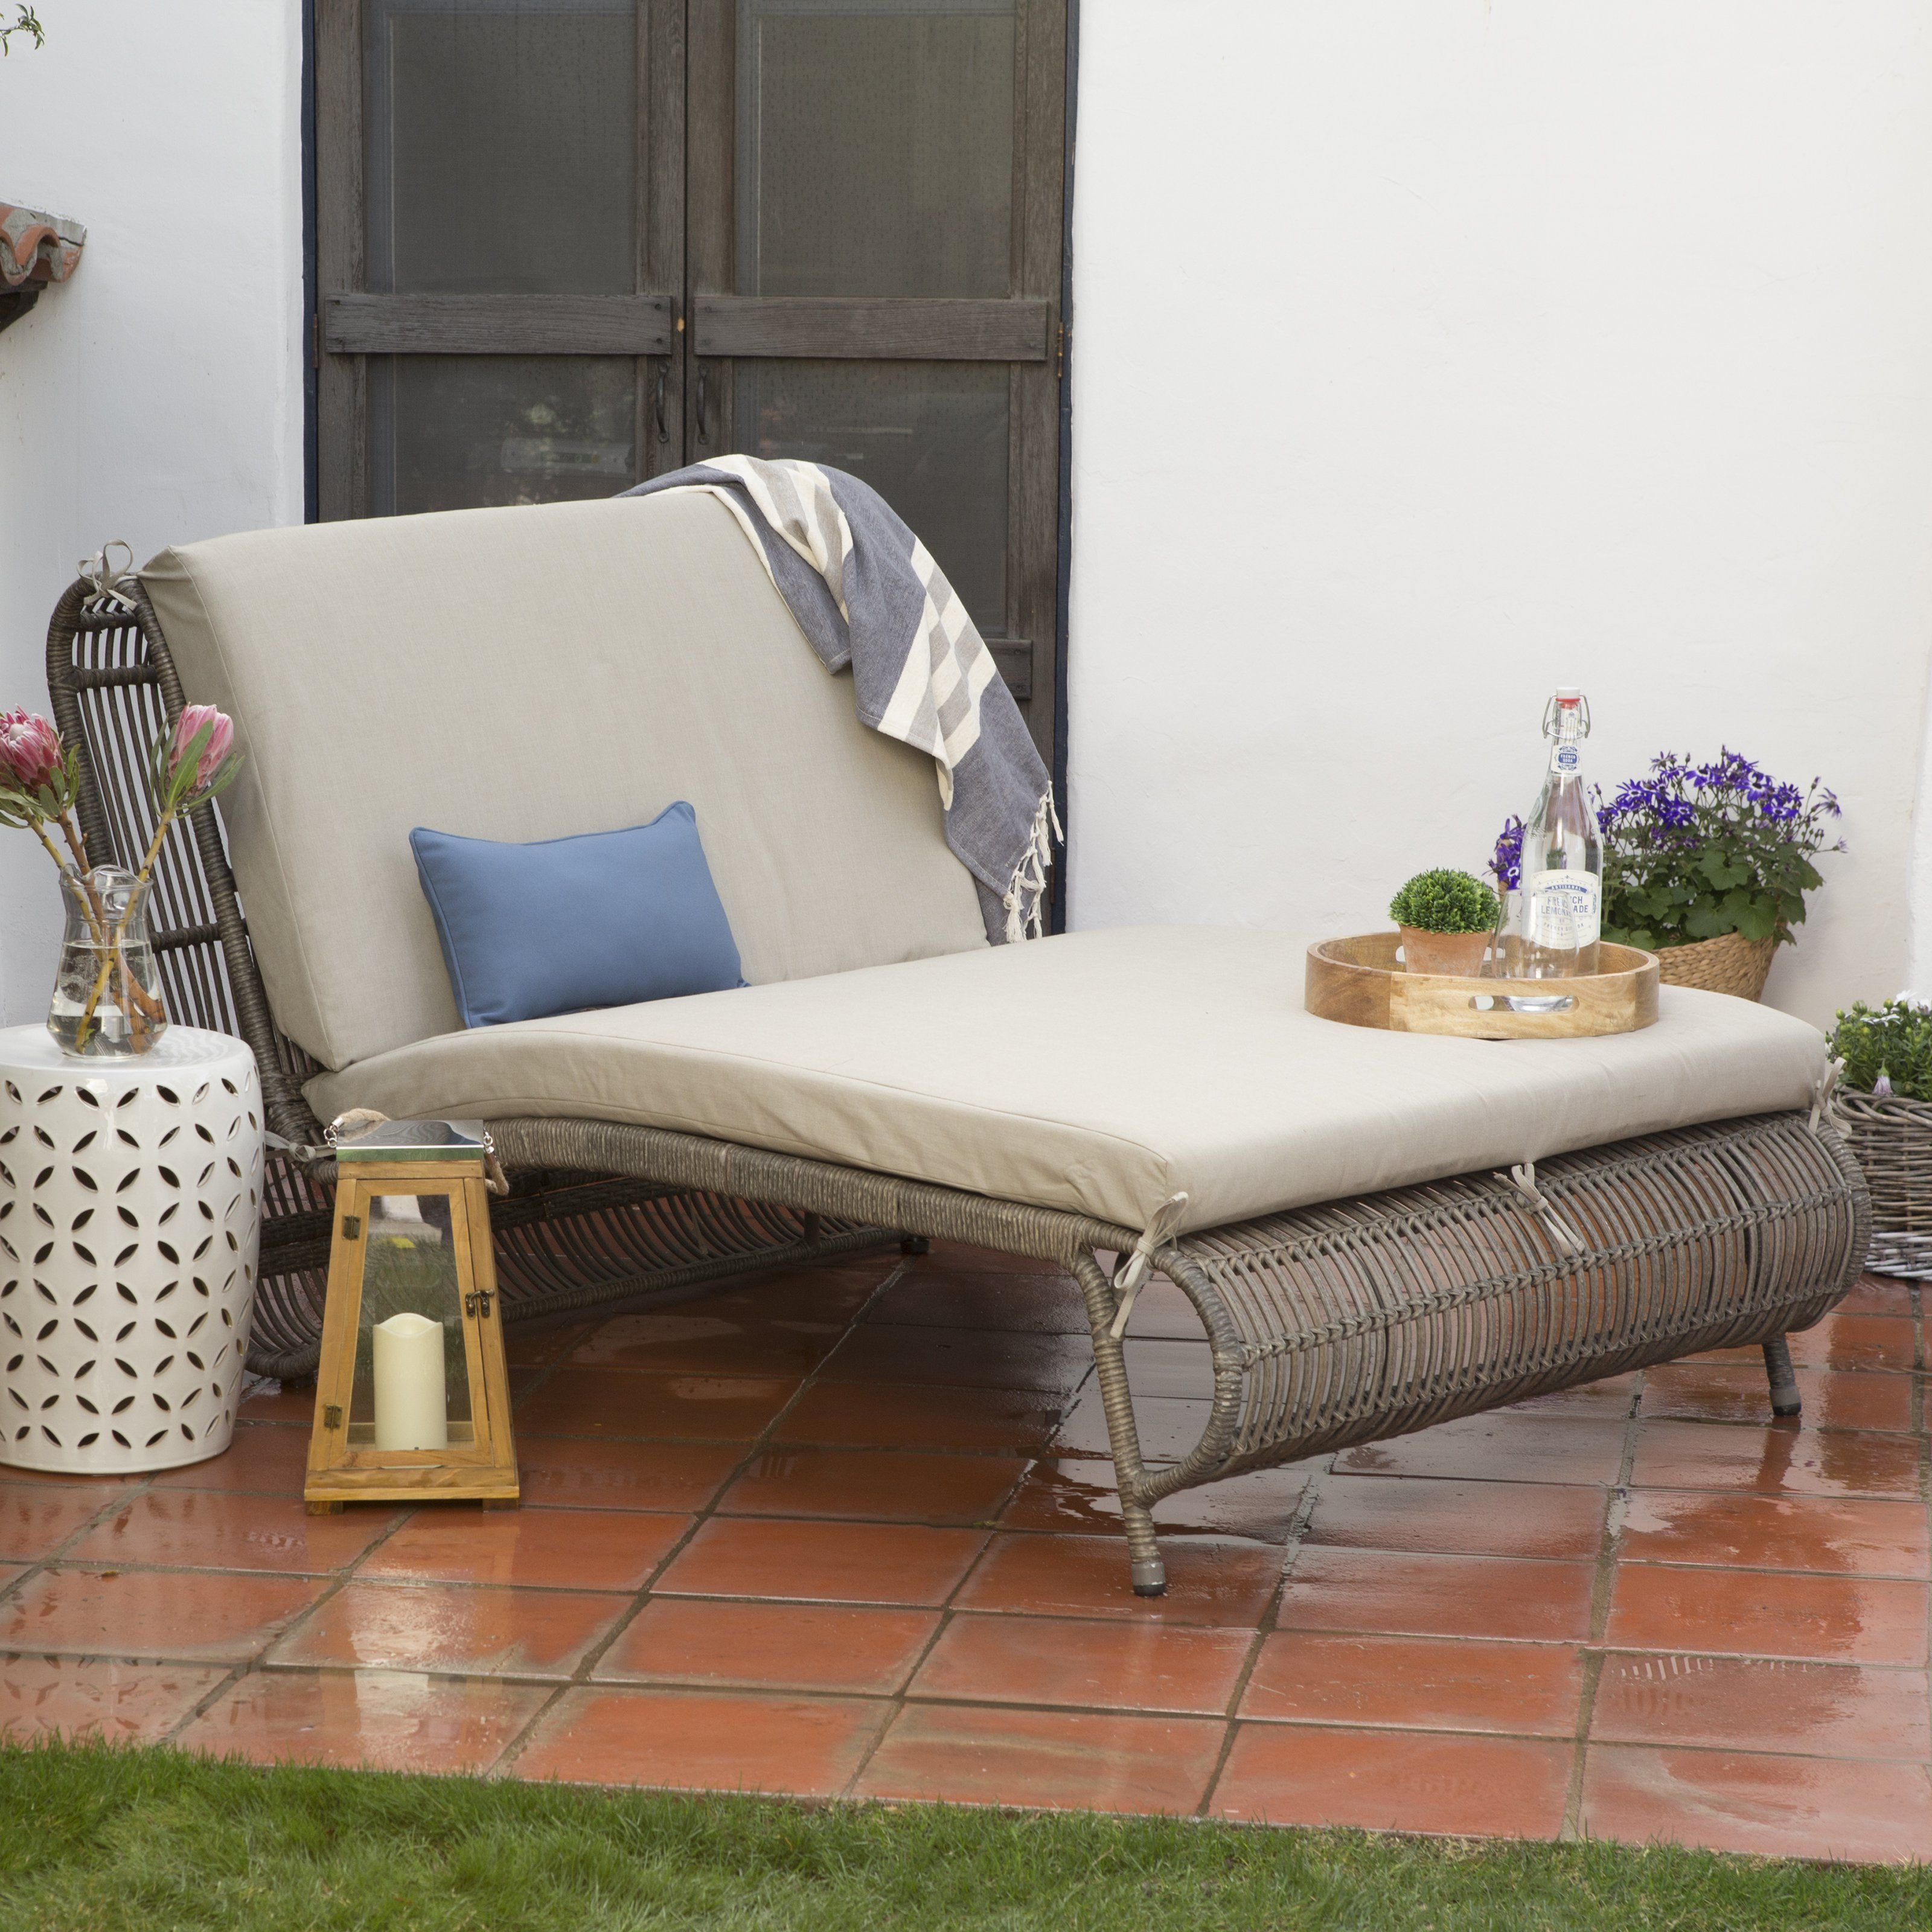 Outdoor Belham Living Batiki Sun Bed Double Chaise Lounge